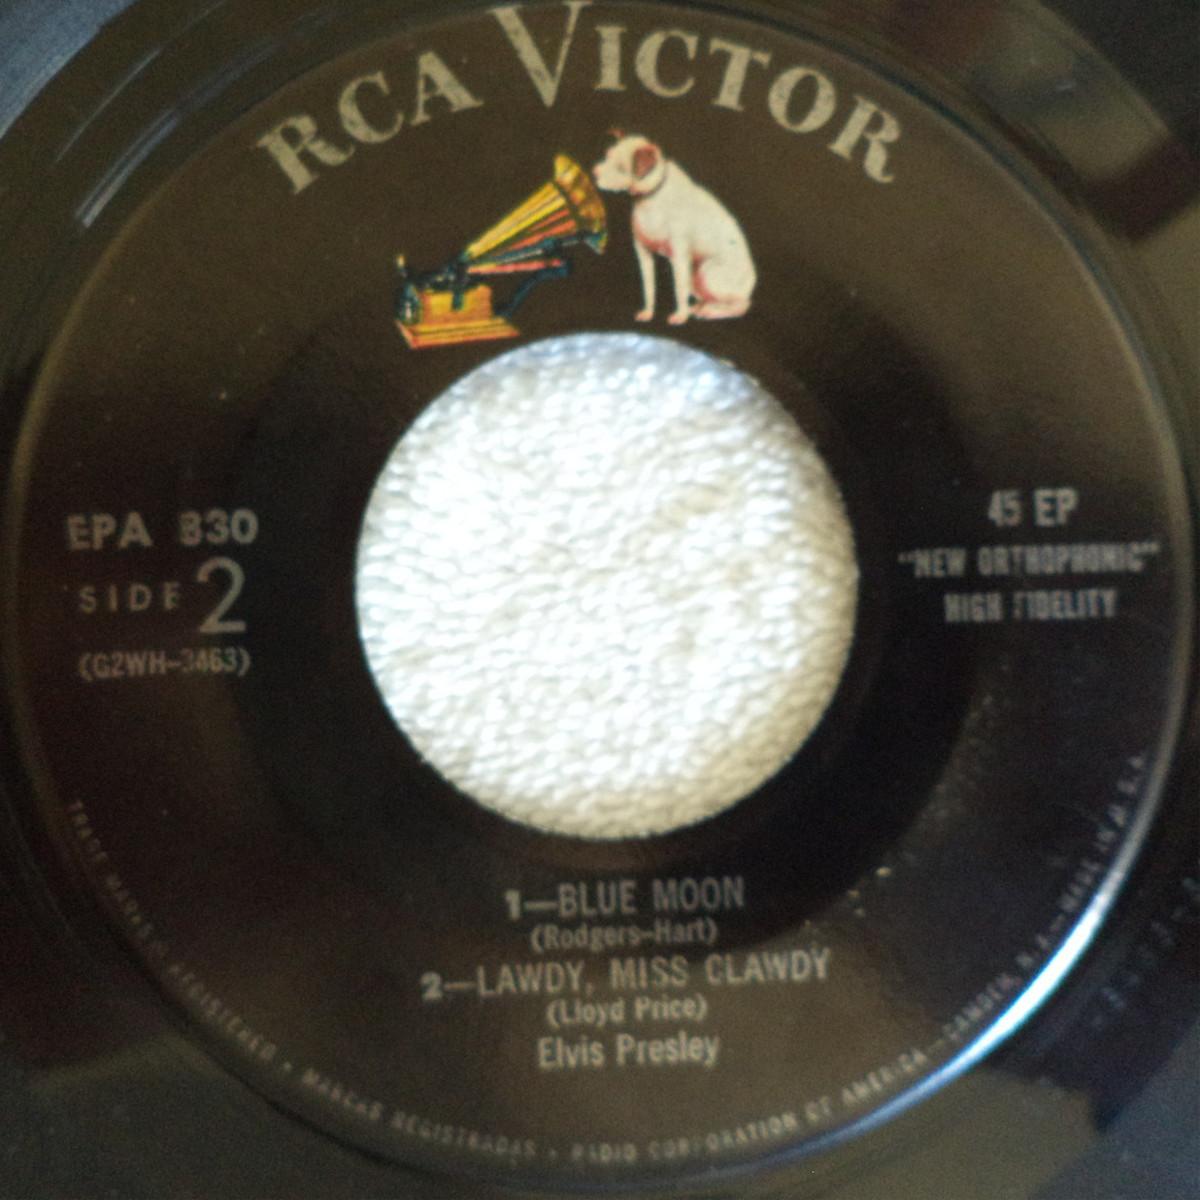 Presley - ELVIS PRESLEY Epa830dizjl6